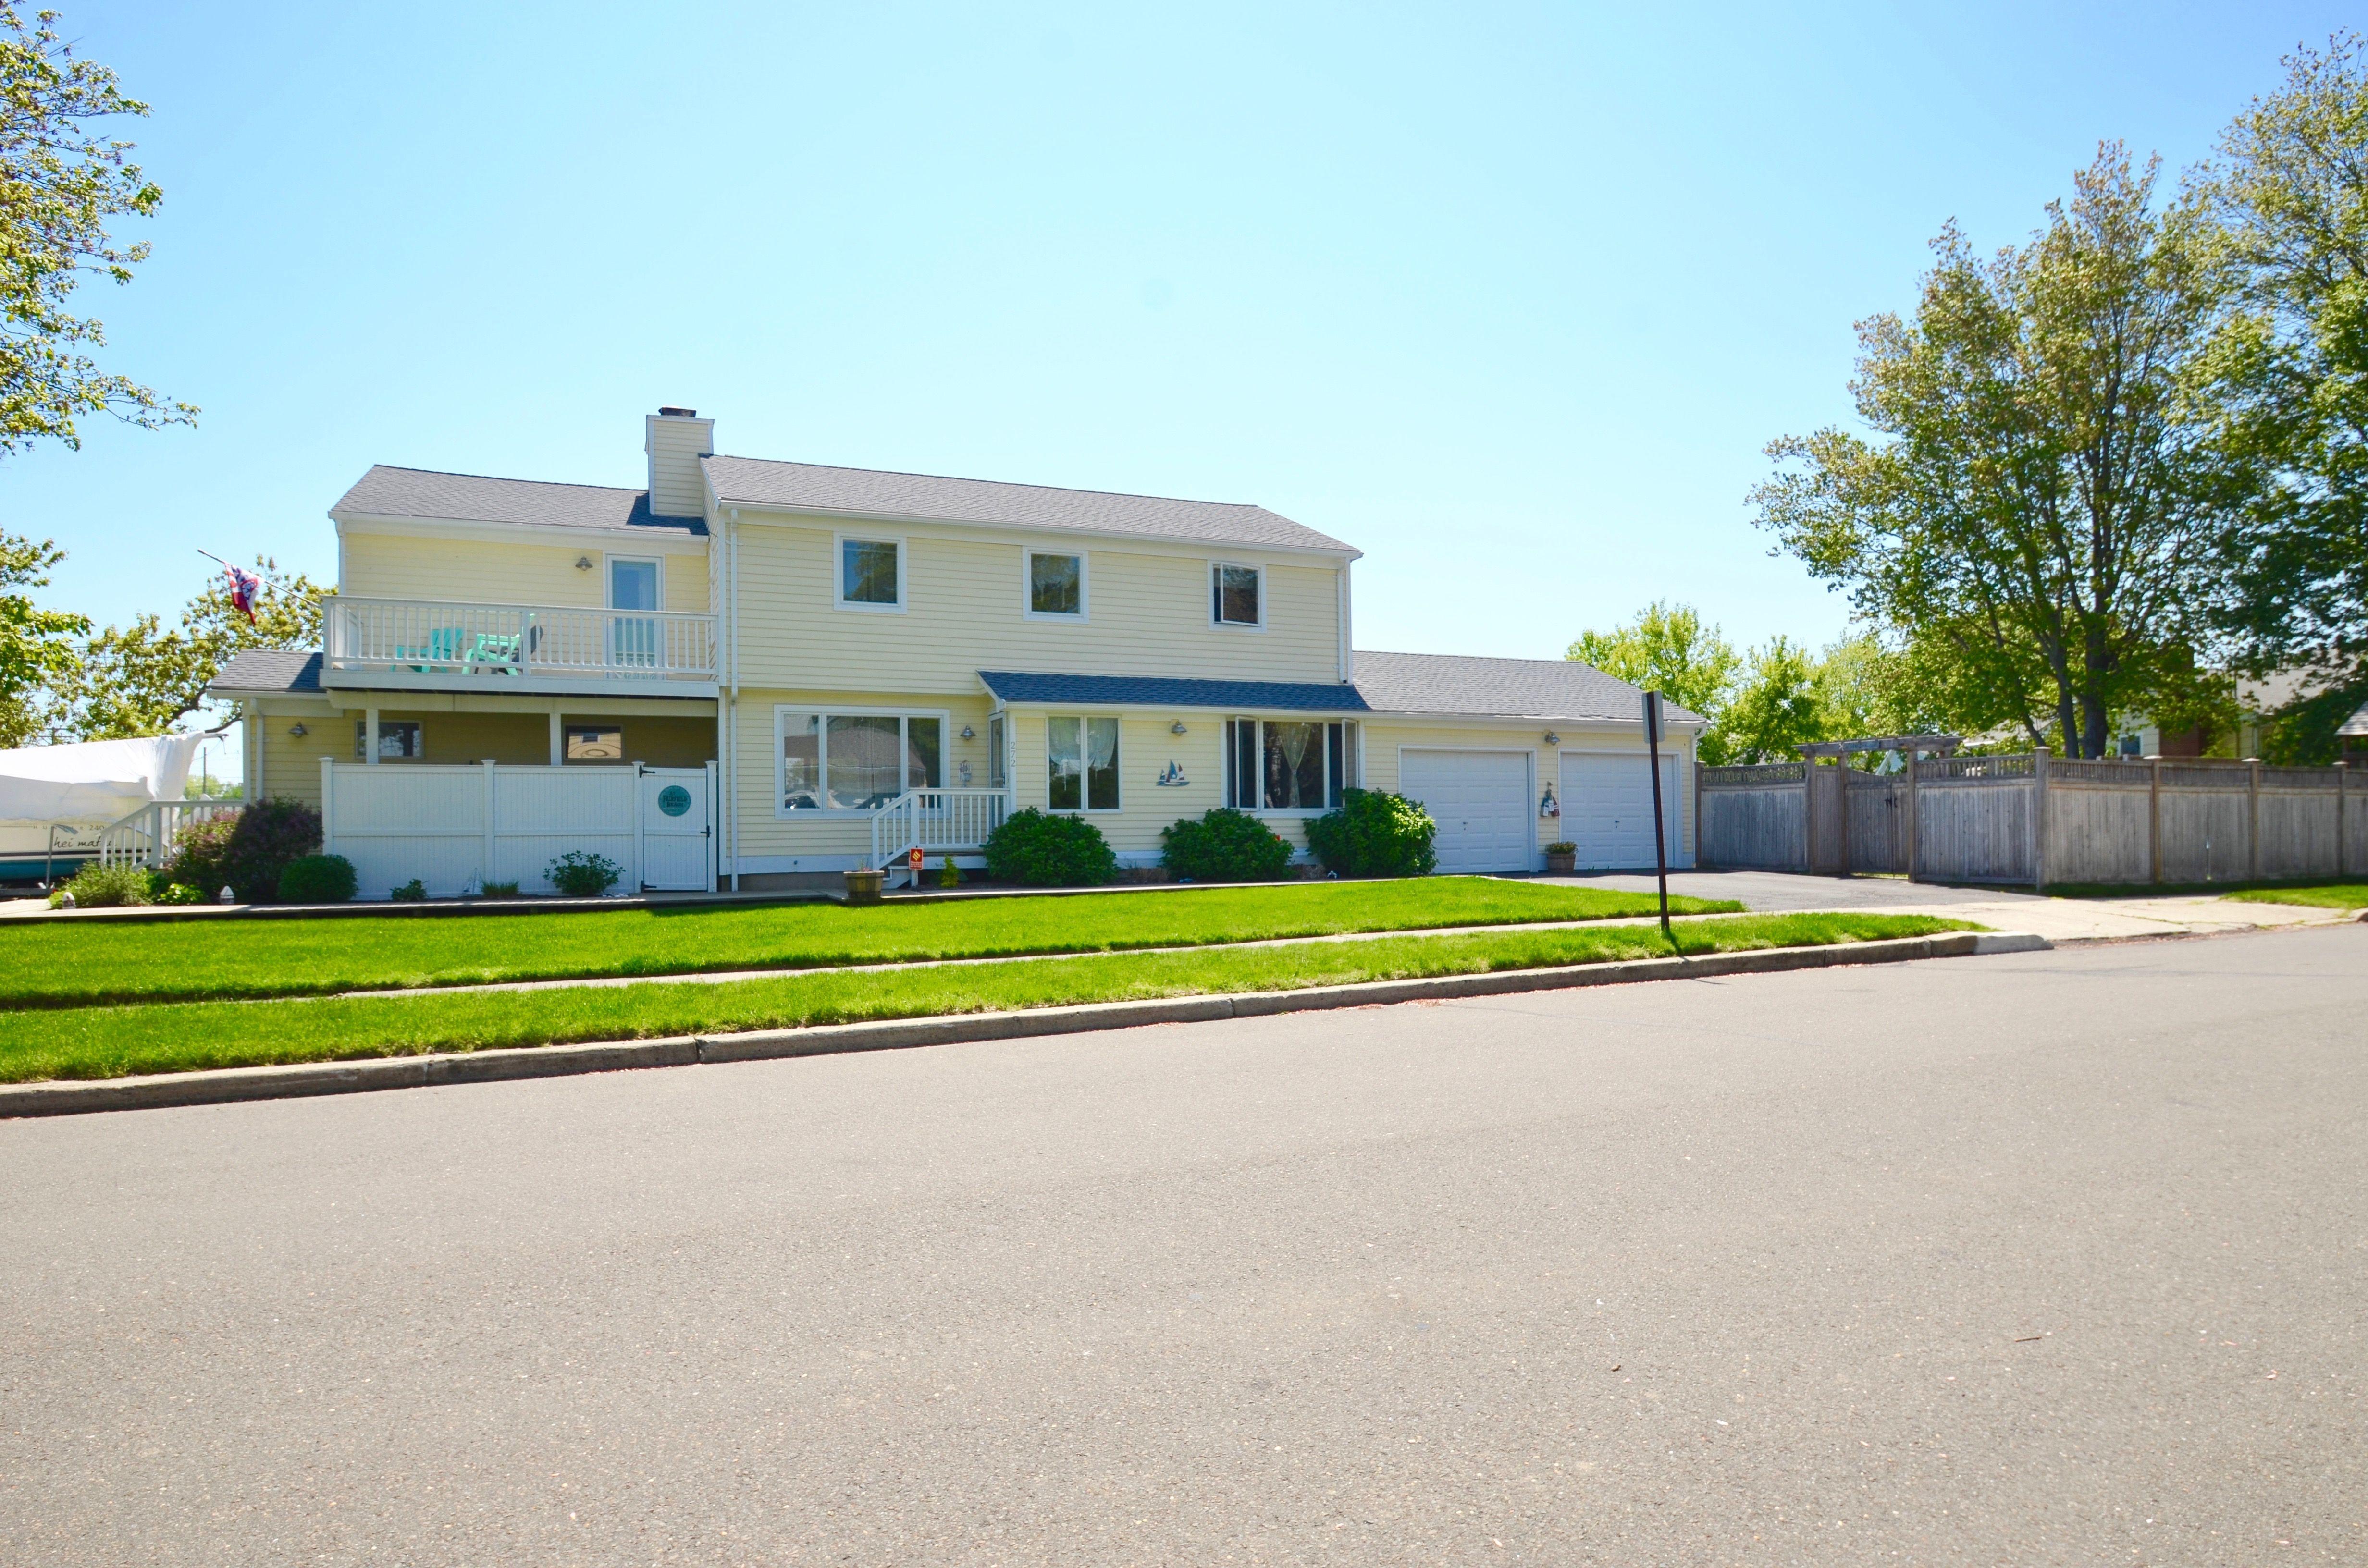 Sold By Jackie Davis 272 Fairfield Beach Road Fairfield Ct Fairfield Beach Beach Road House Styles